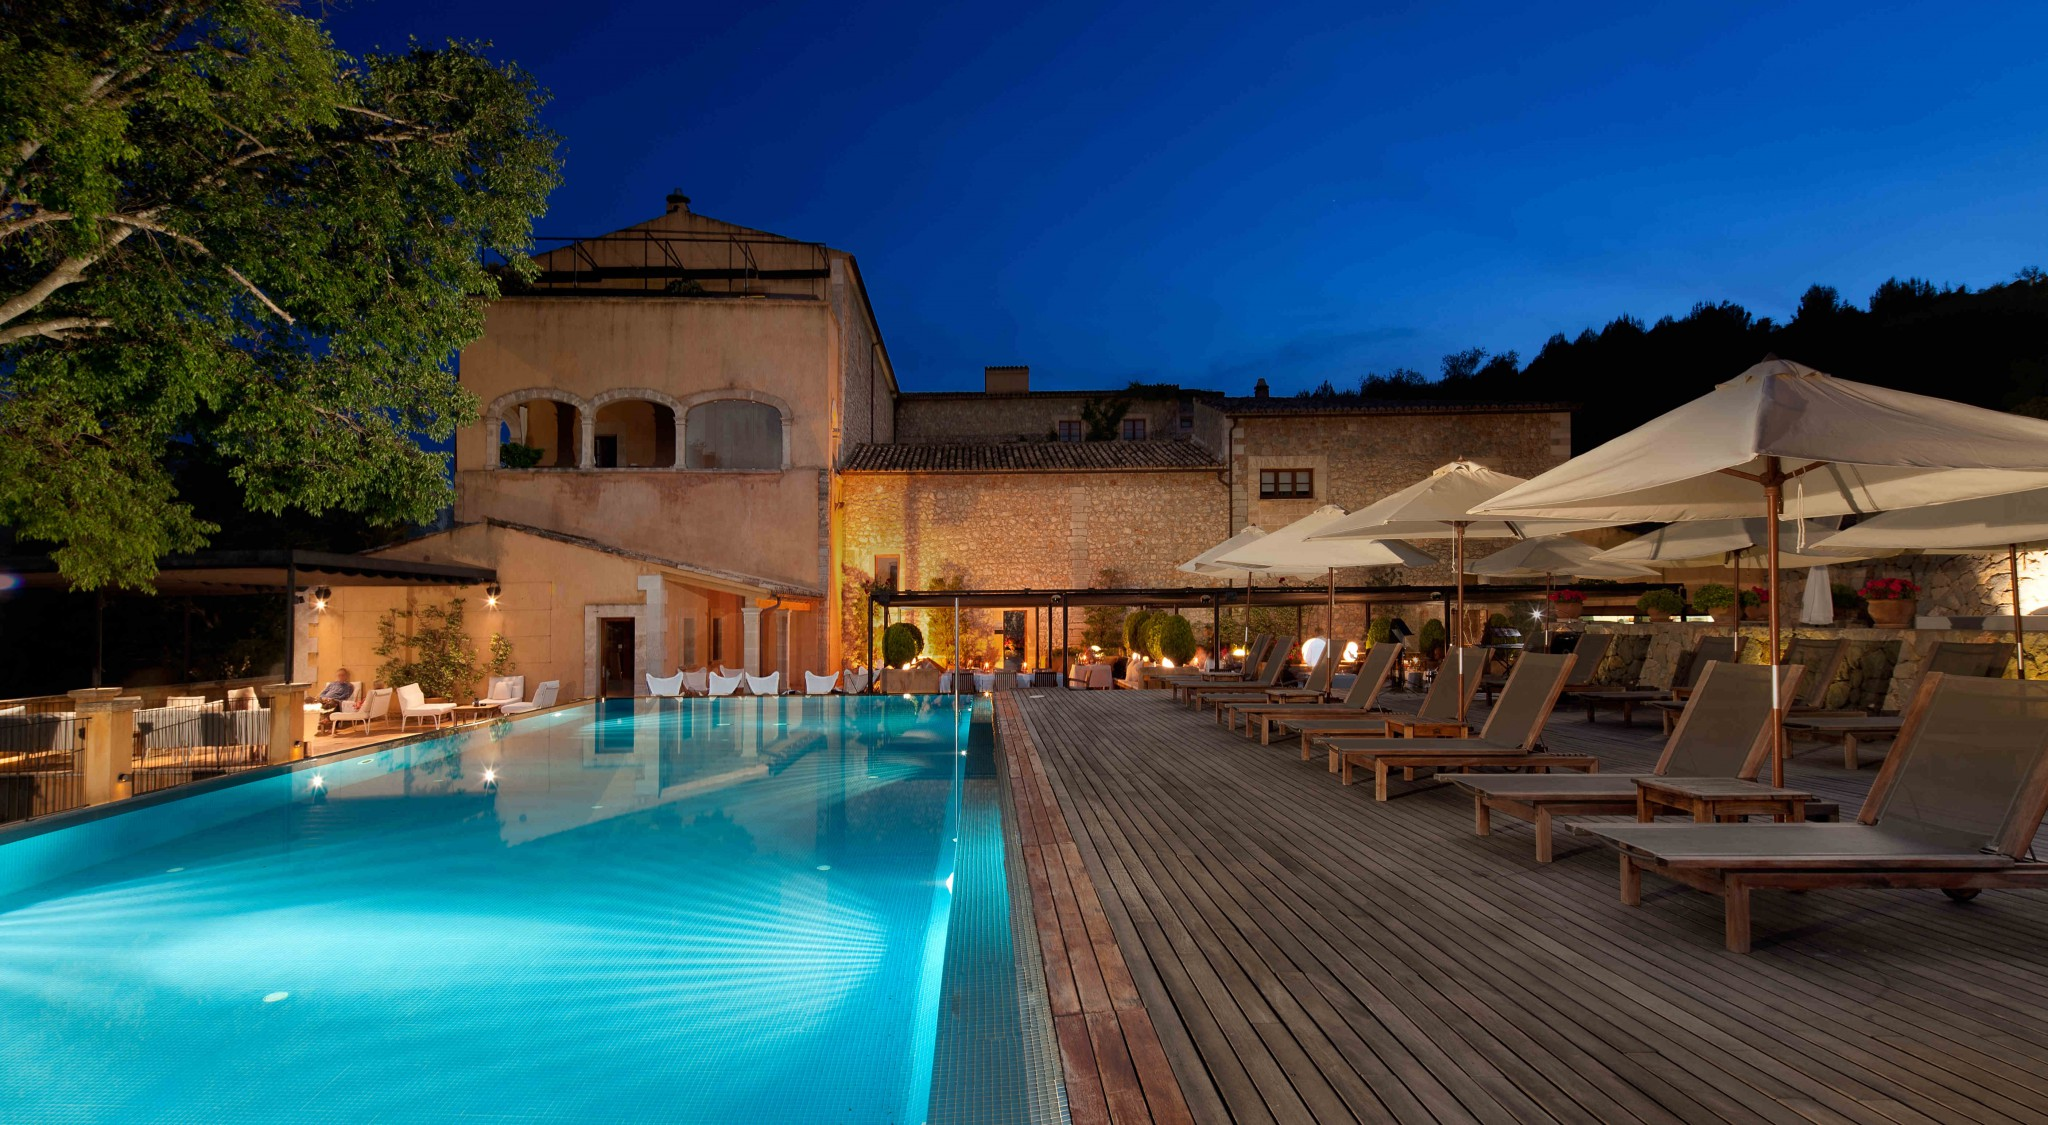 Hoteles con encanto en mallorca son brull en la sierra de tramuntana - Hoteles con encanto y piscina ...